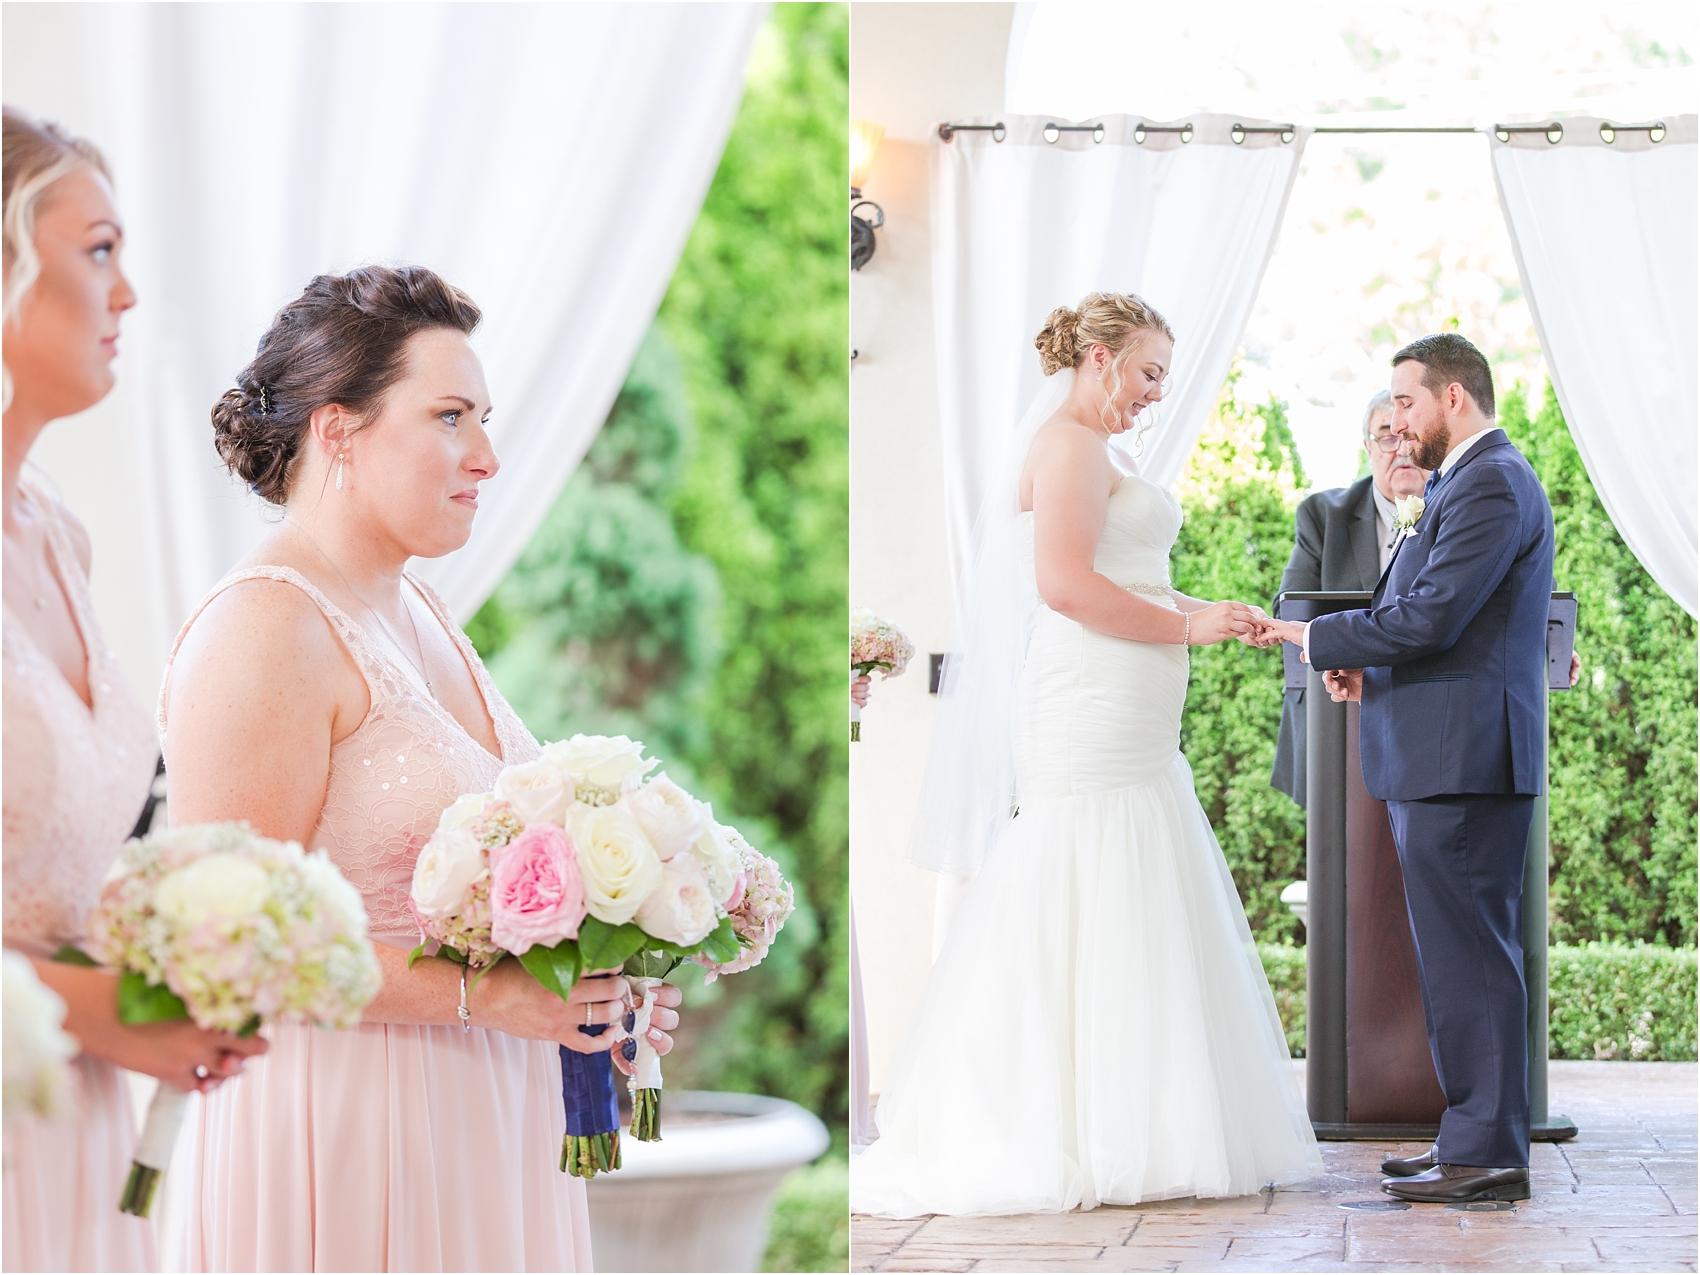 joyful-and-candid-navy-blush-wedding-photos-at-crystal-gardens-in-howell-mi-by-courtney-carolyn-photography_0051.jpg